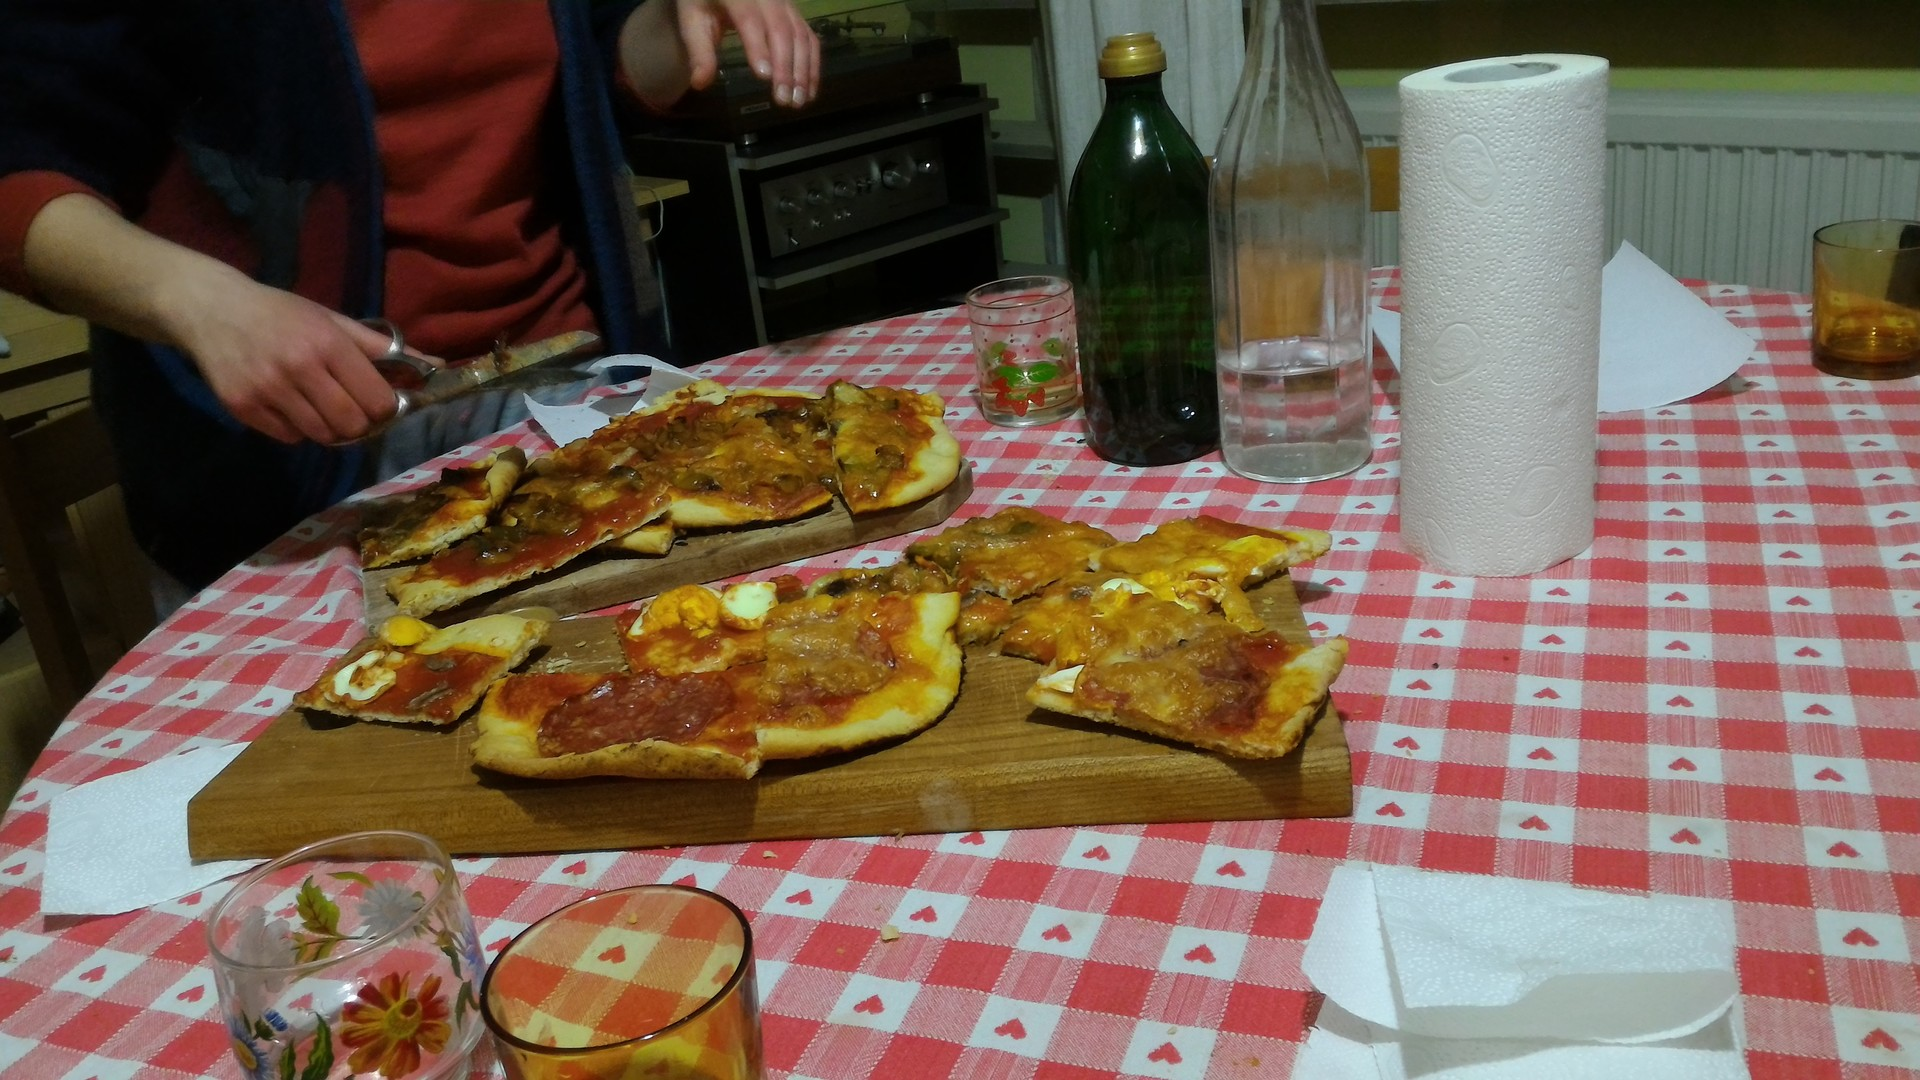 home-pizza-2c47ae2369848c2b1130765ea3a8f